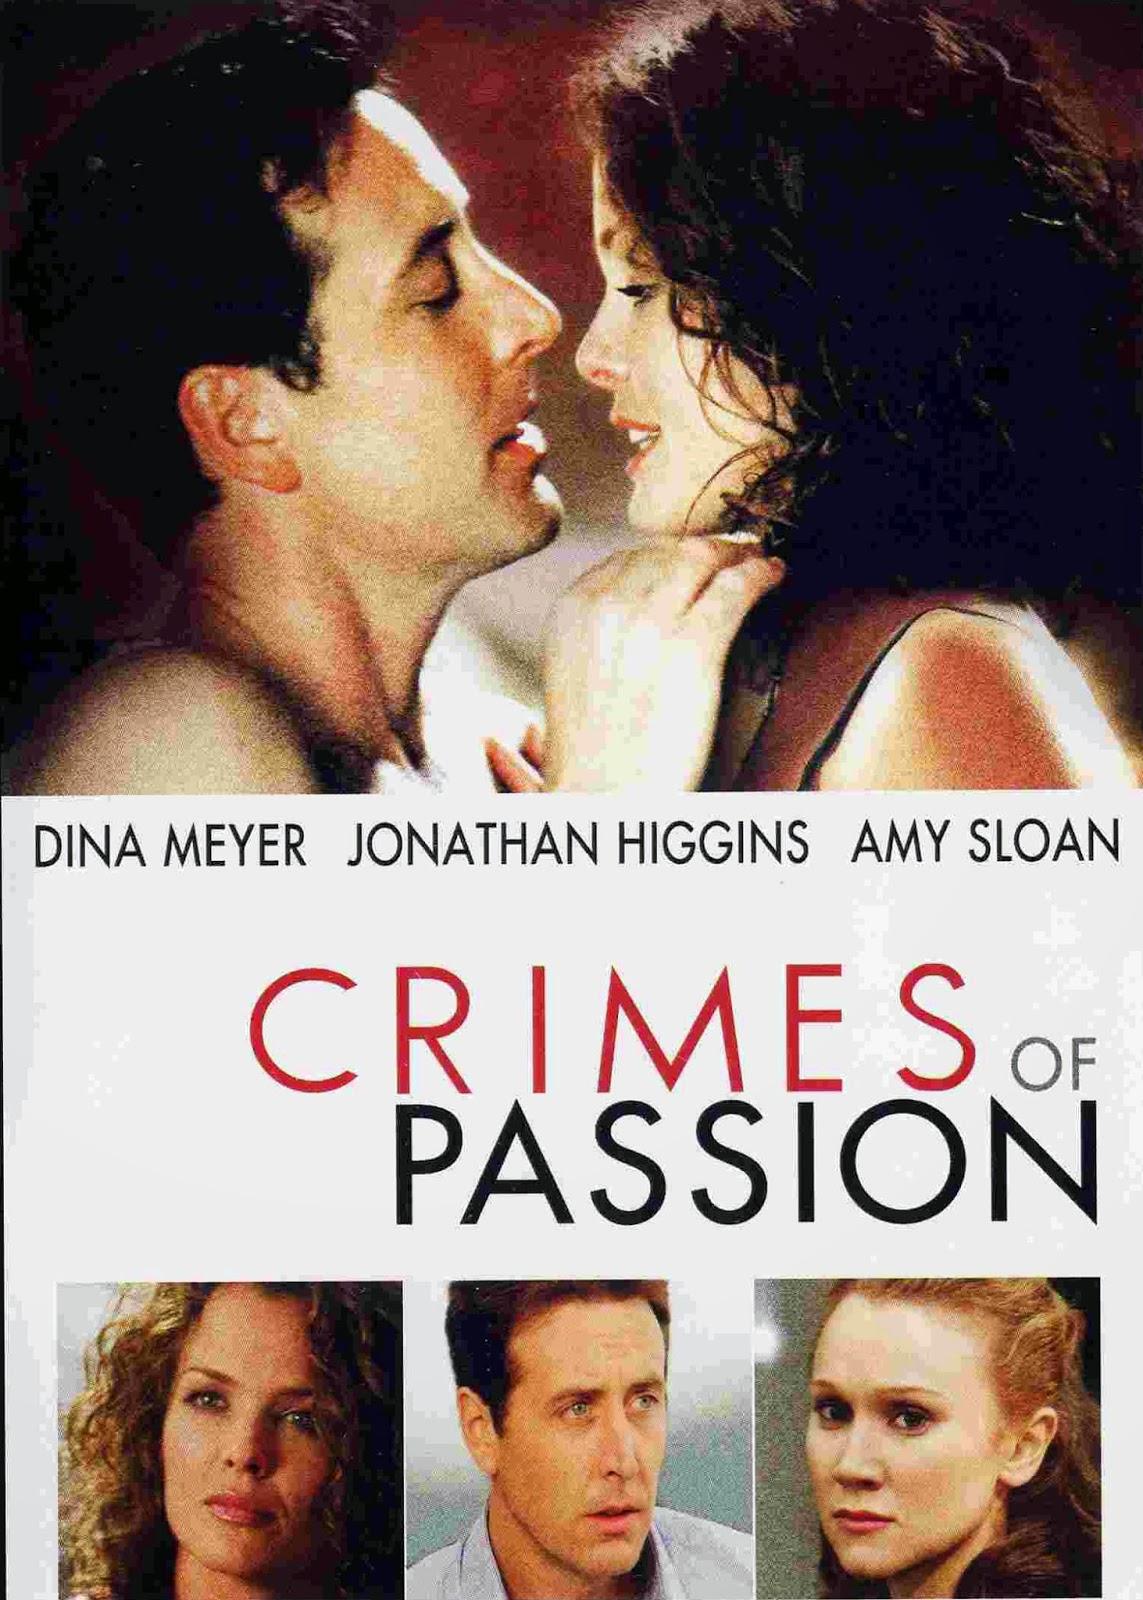 Crimen Pasional (2005)